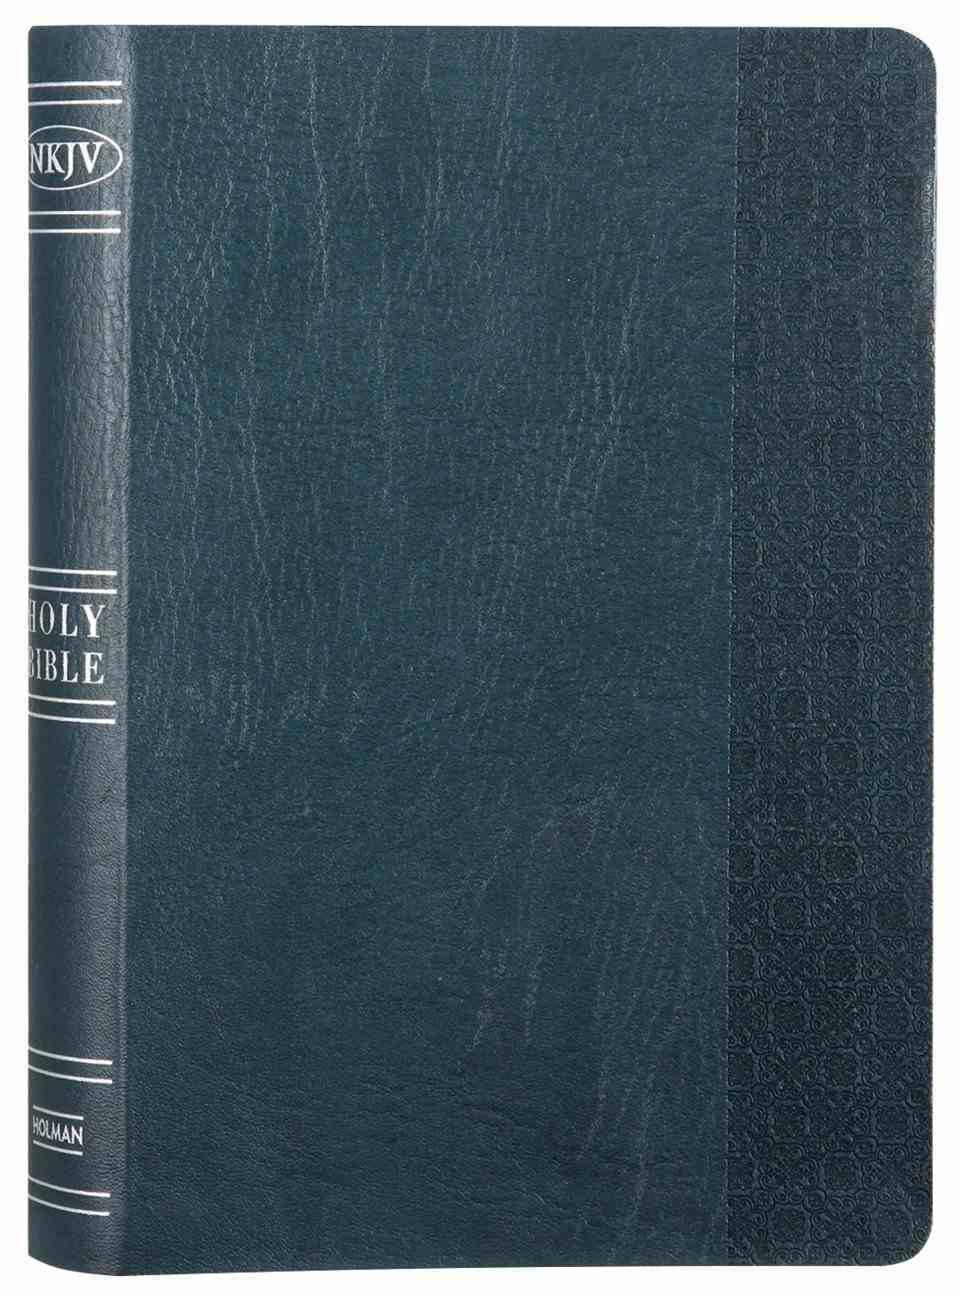 NKJV Large Print Personal Size Reference Bible Slate Blue Premium Imitation Leather